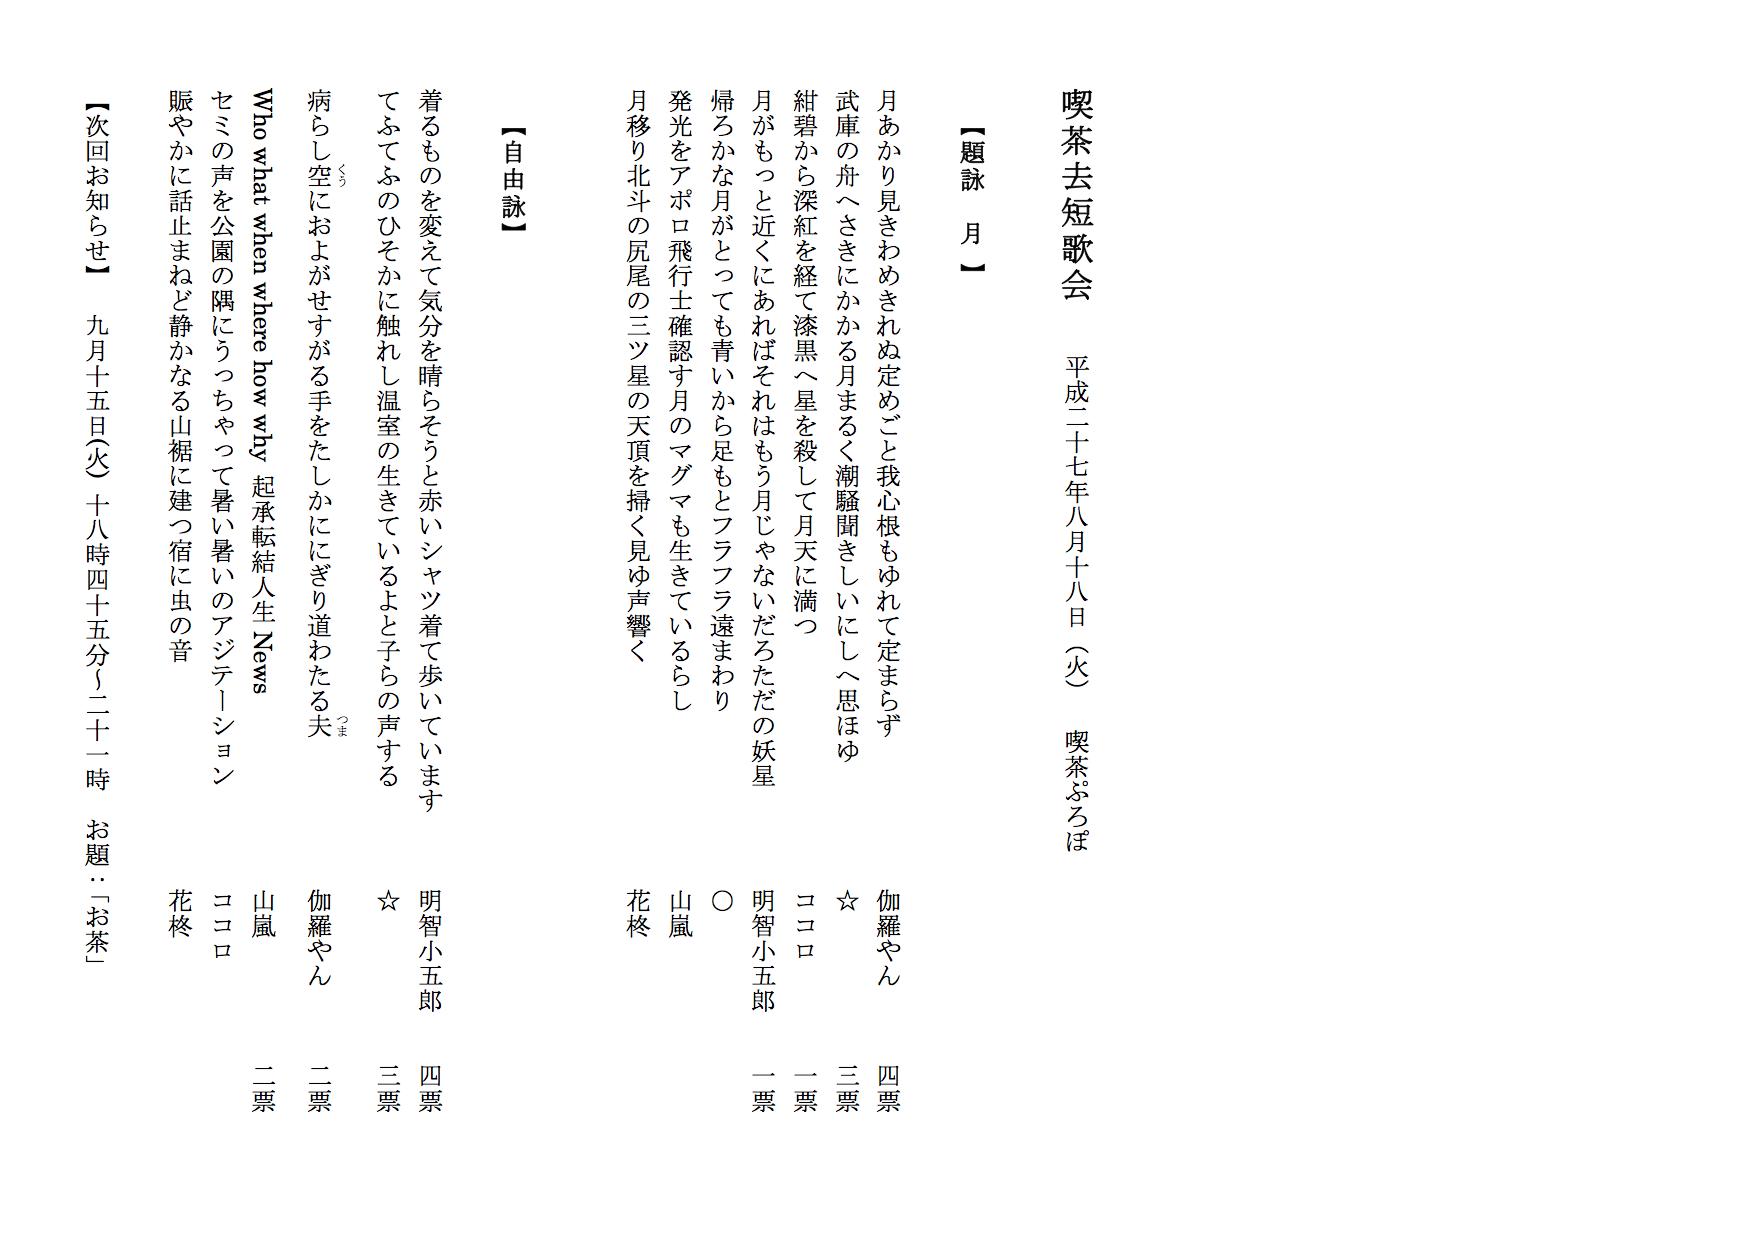 01508 喫茶去短歌会  平成二十七年八月十八日(火) 喫茶ぷろぽ